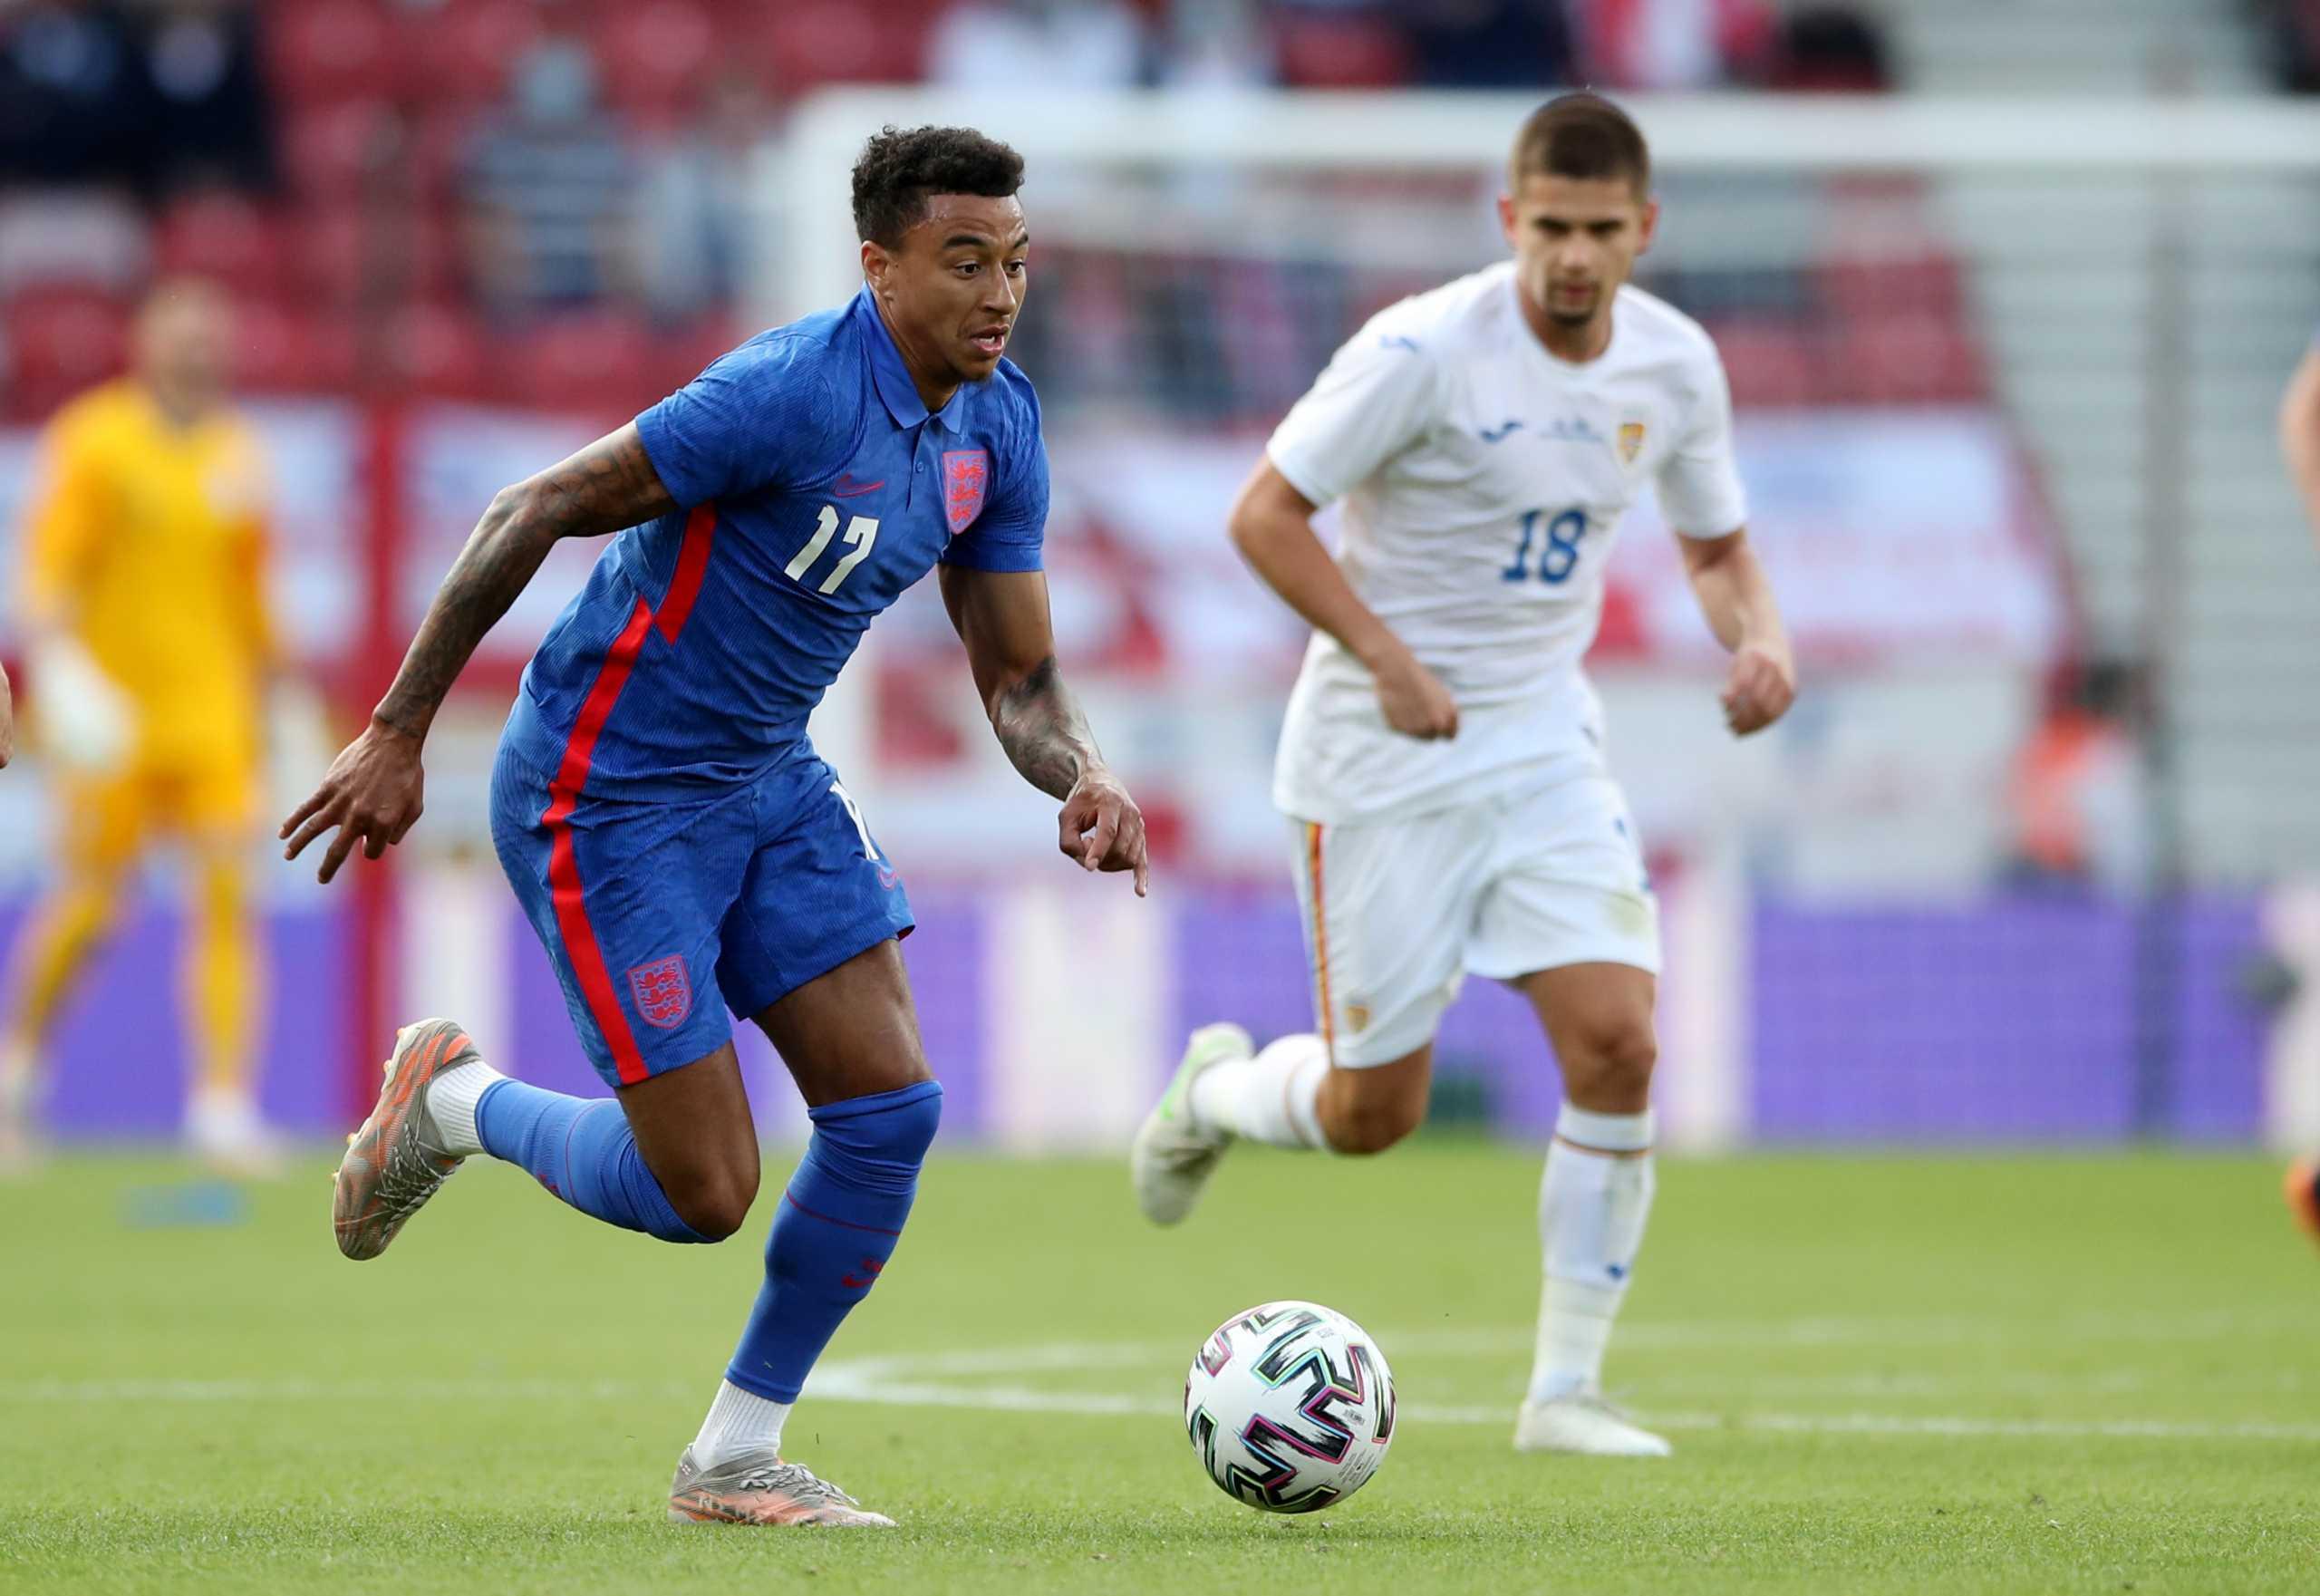 Euro 2020: Ο Λίνγκαρντ πανηγύρισε για την Αγγλία στη Μύκονο